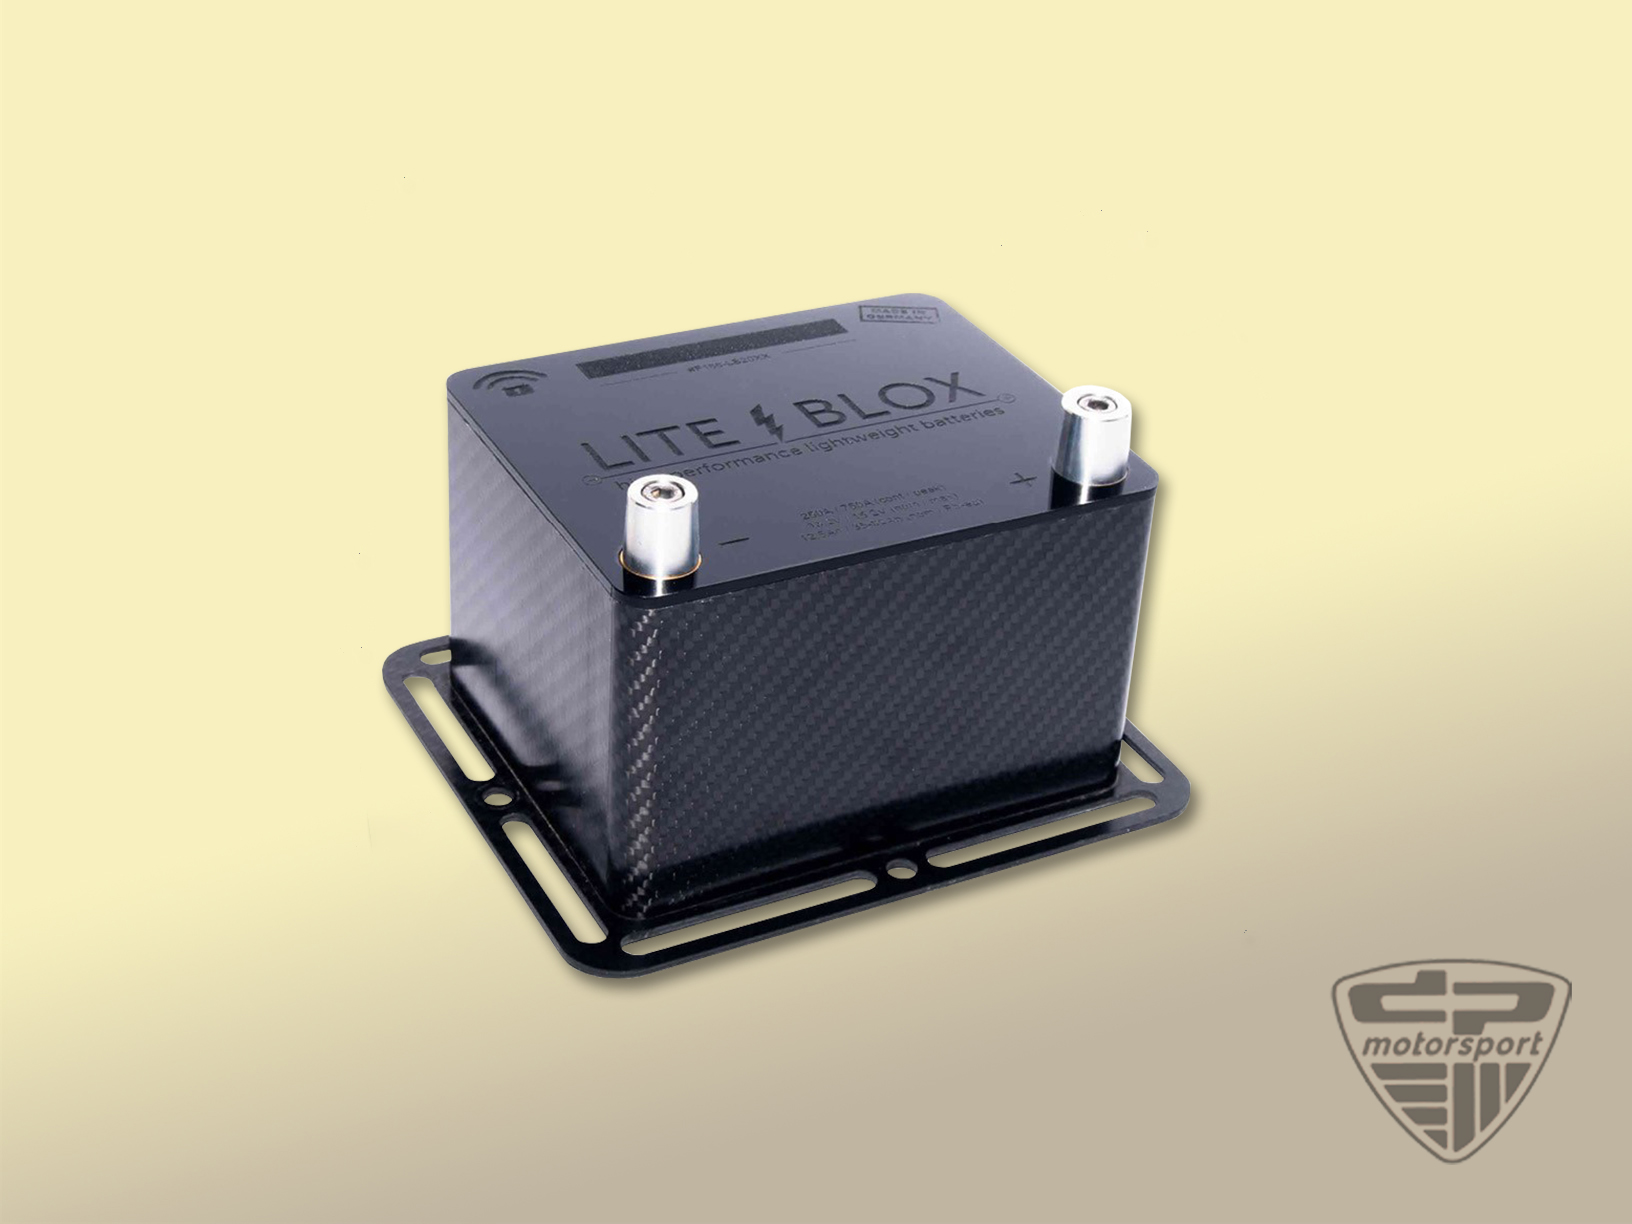 LB14XX